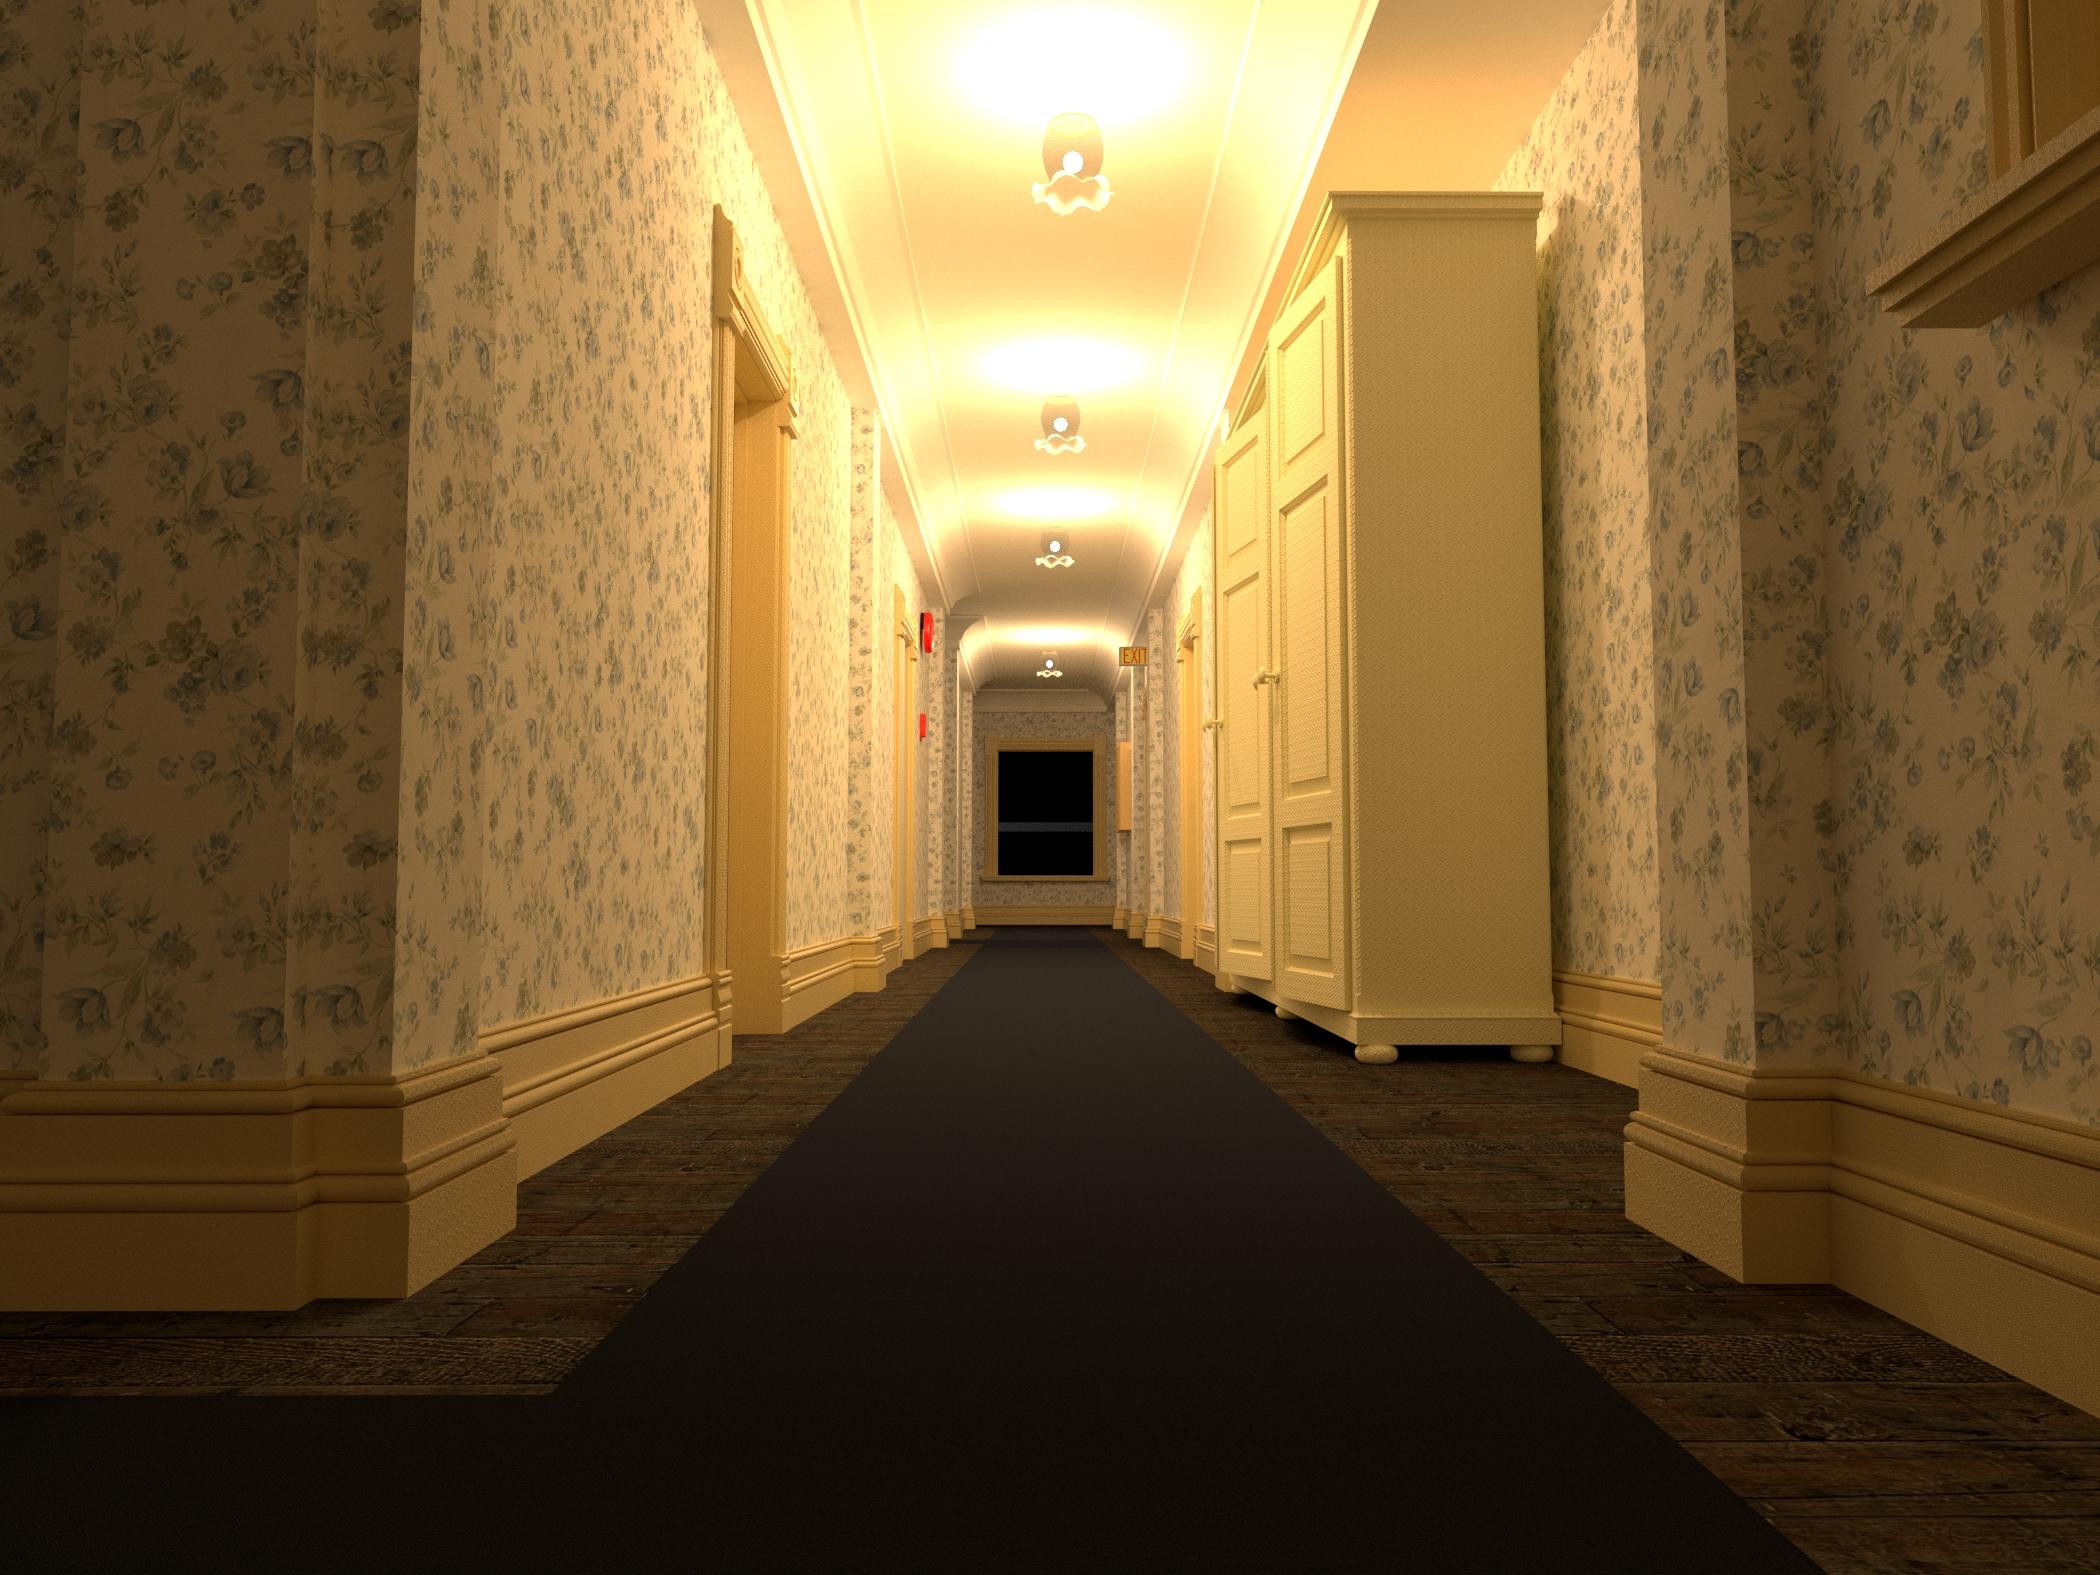 Twins corridor